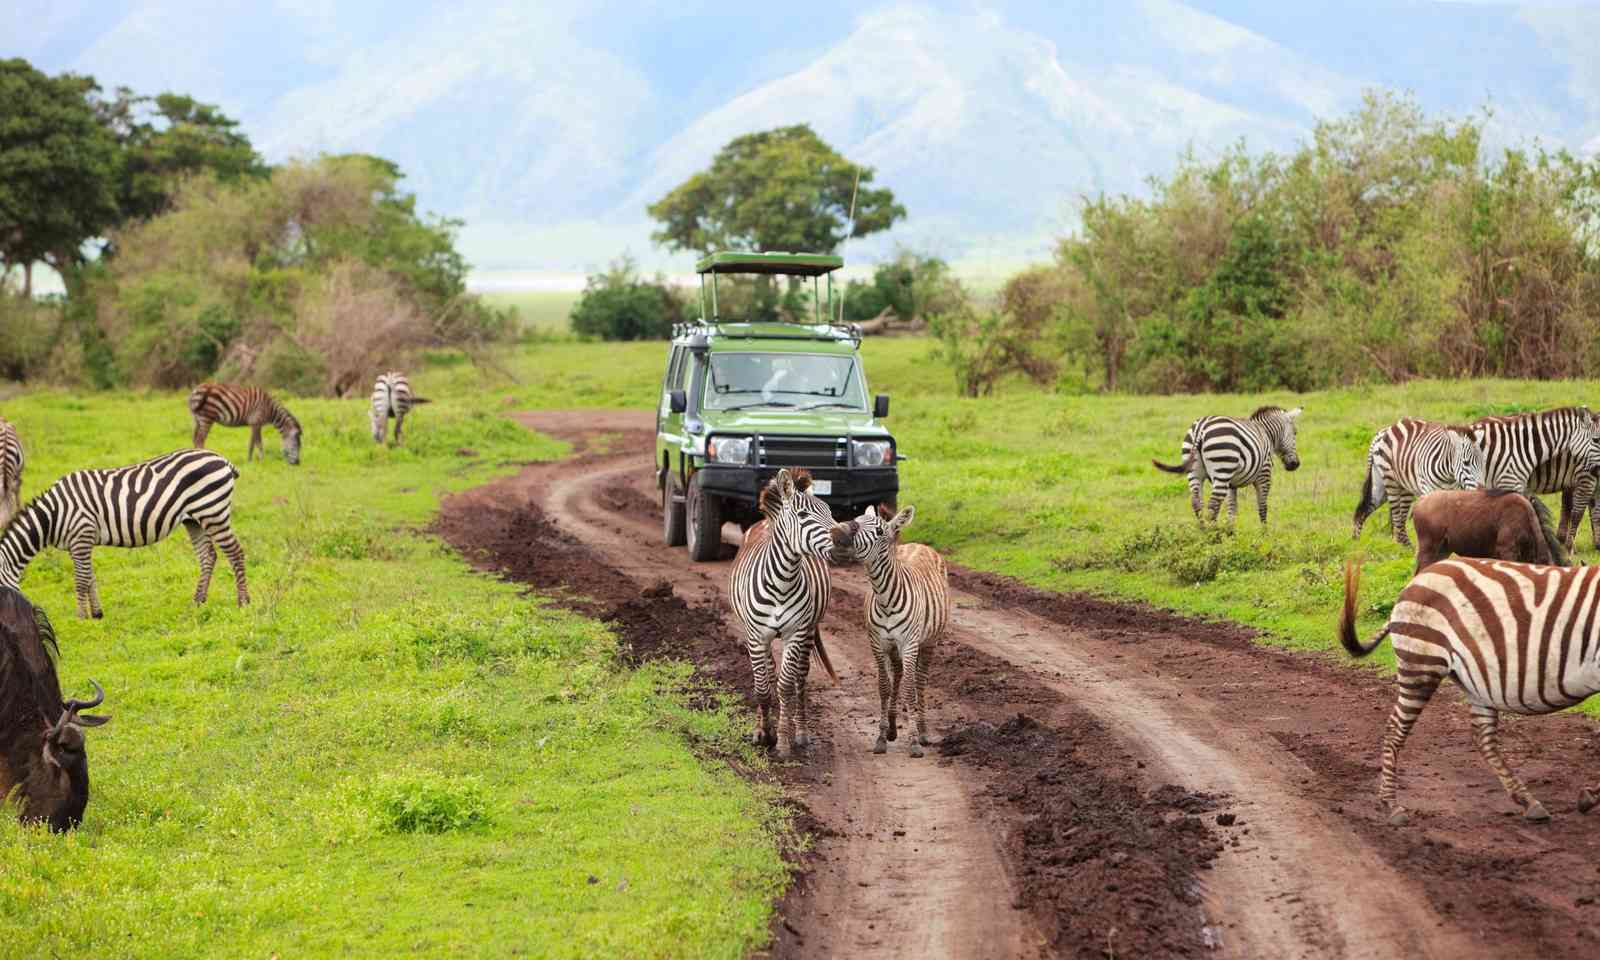 Game drive in Ngorongoro Crater (Shutterstock.com)